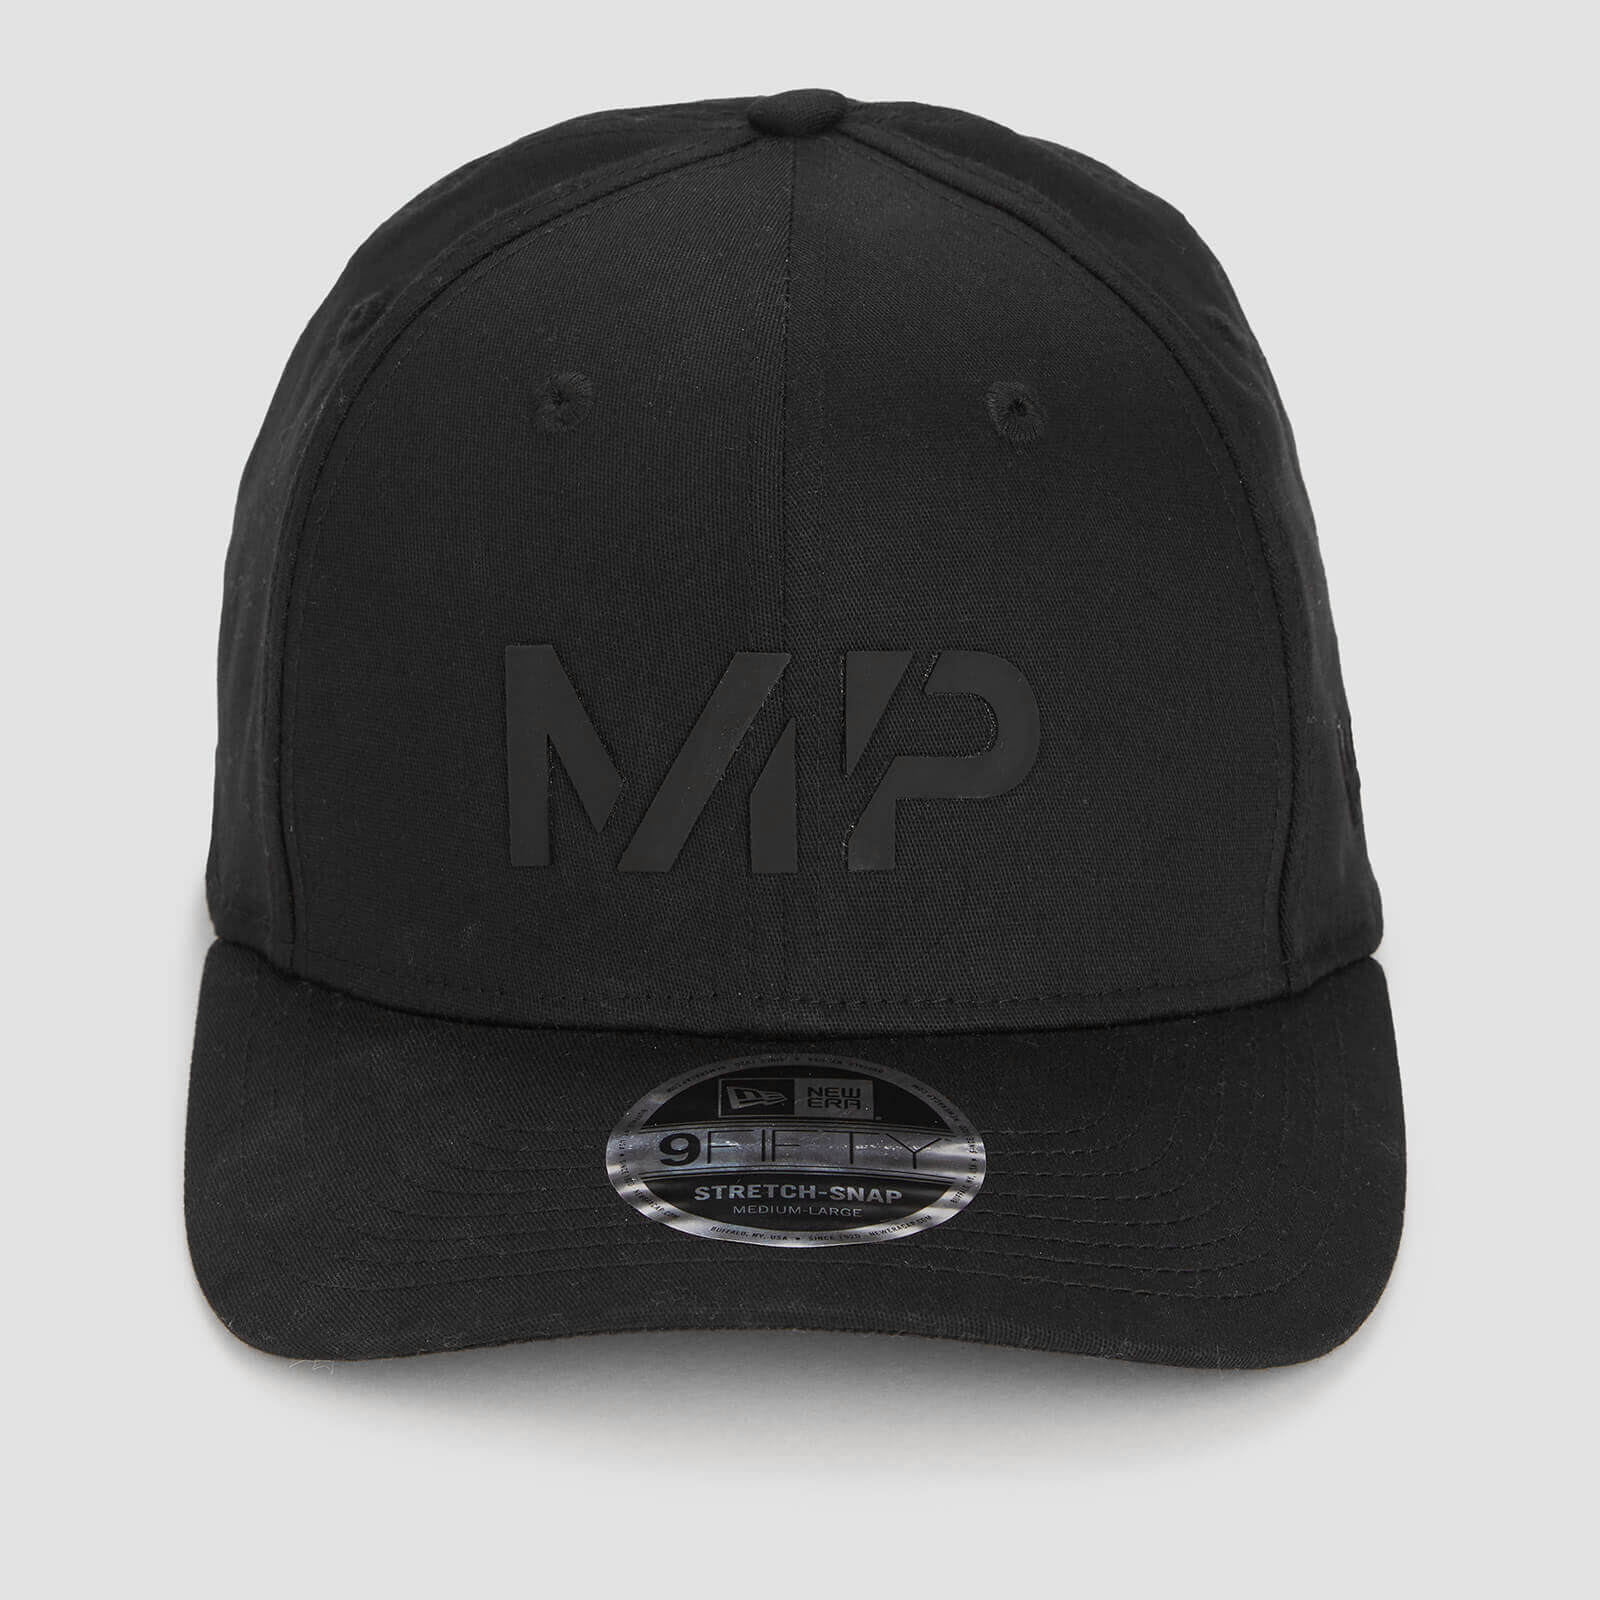 MP New Era 9FIFTY Stretch Snapback - Black/Black - S-M